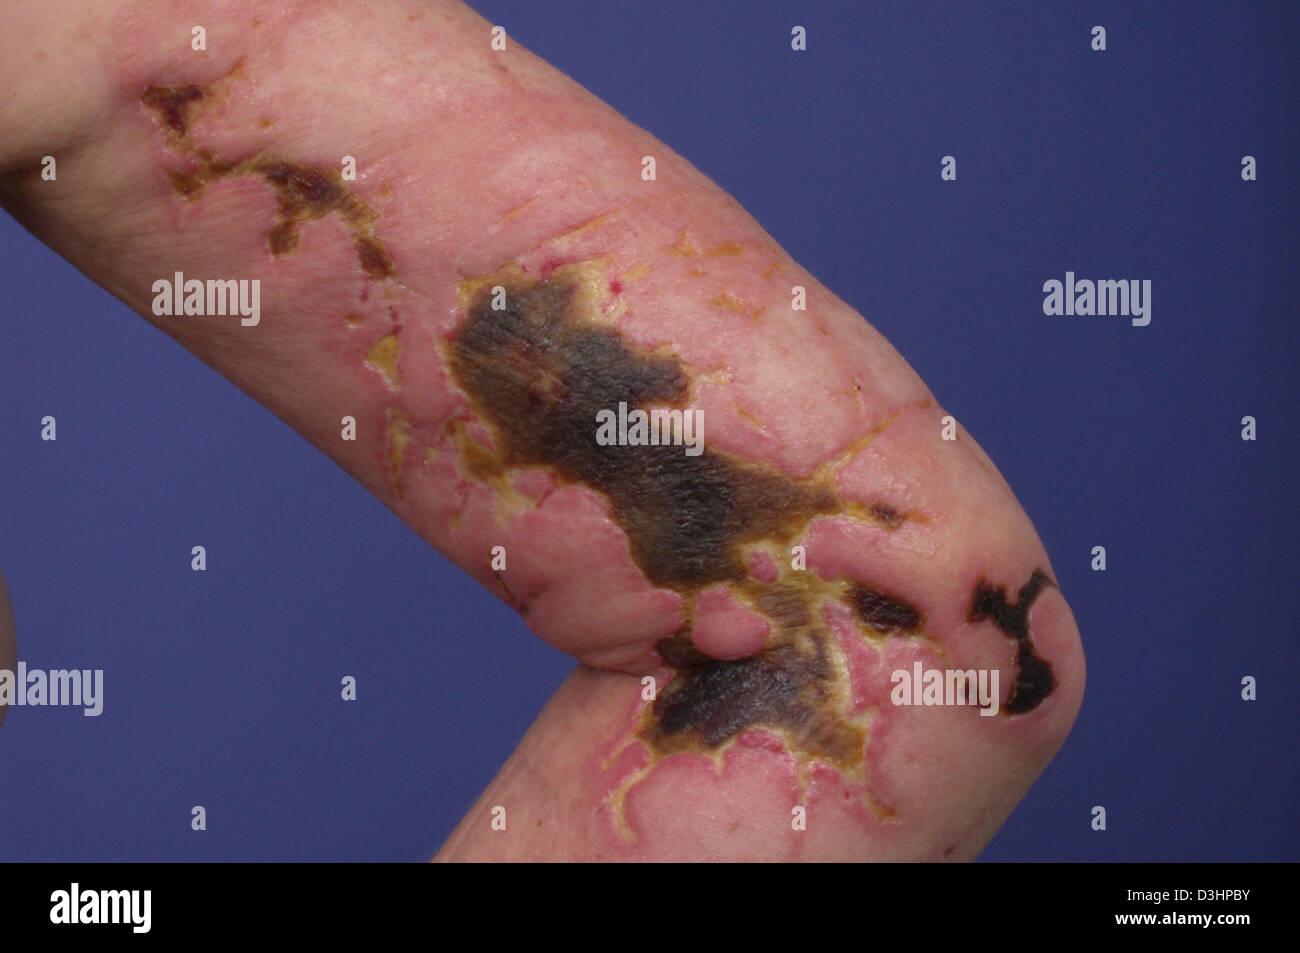 jellyfish sting skin stock photos jellyfish sting skin stock